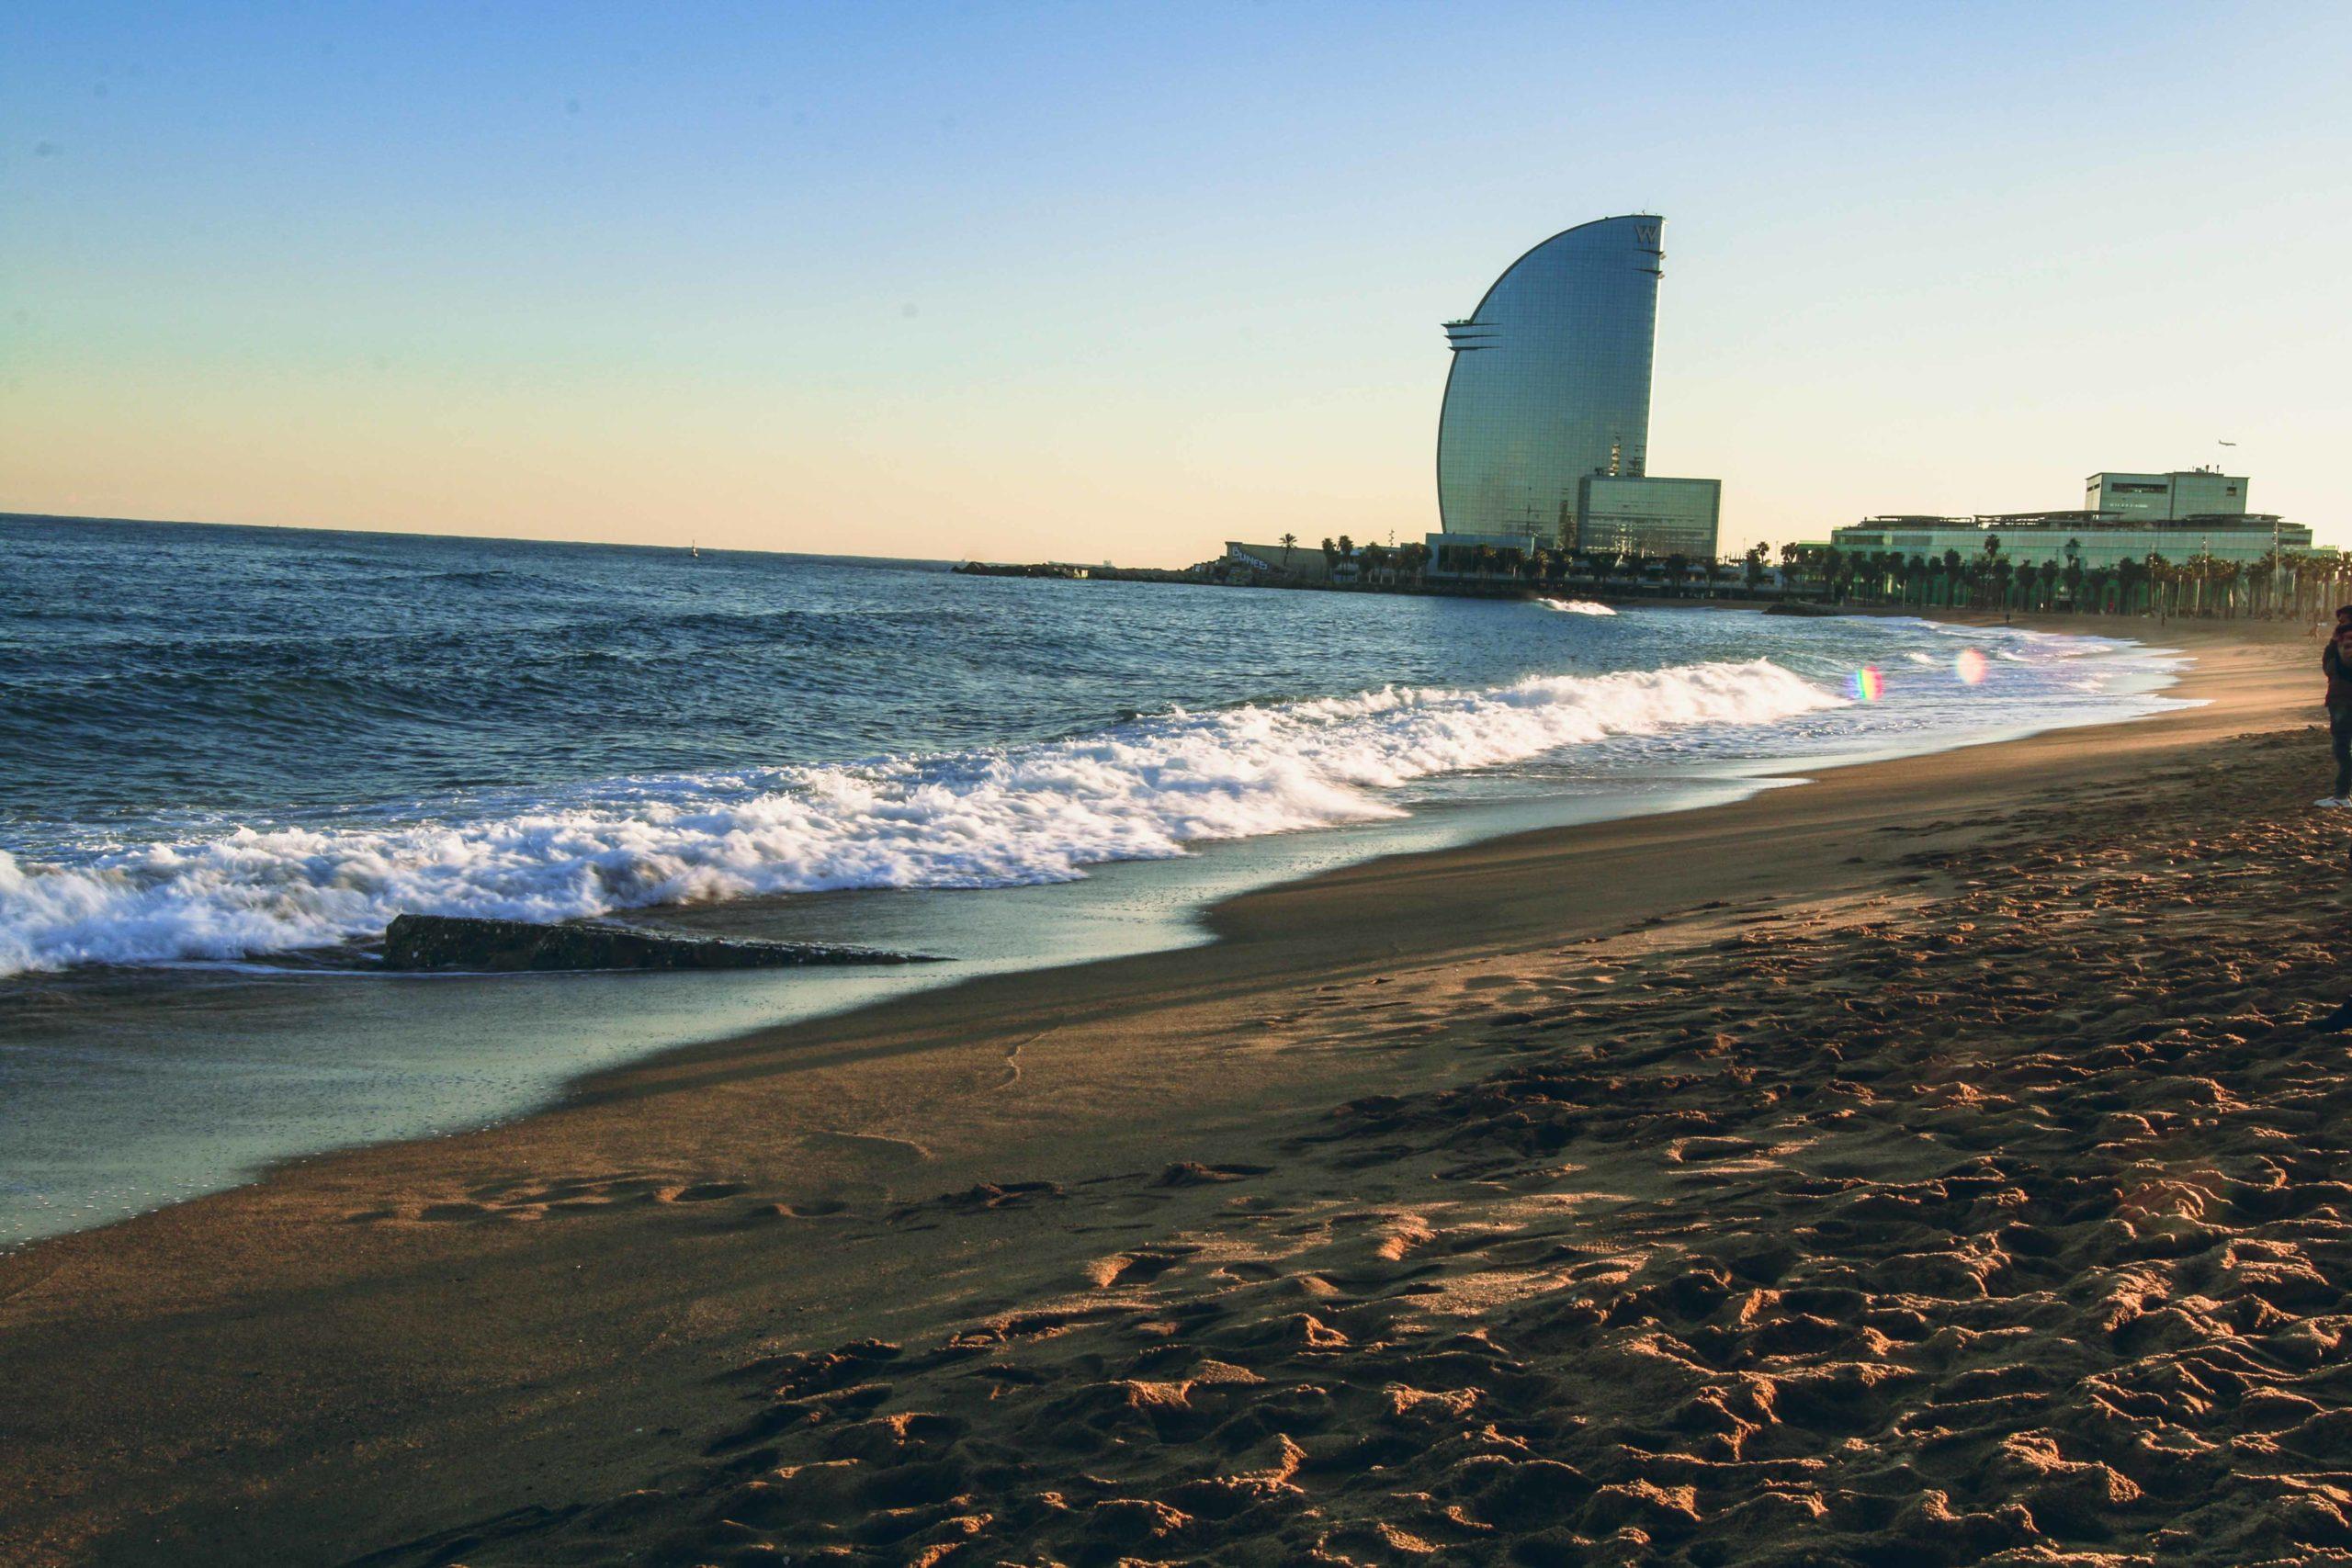 barceloneta beach, barcelona, spain